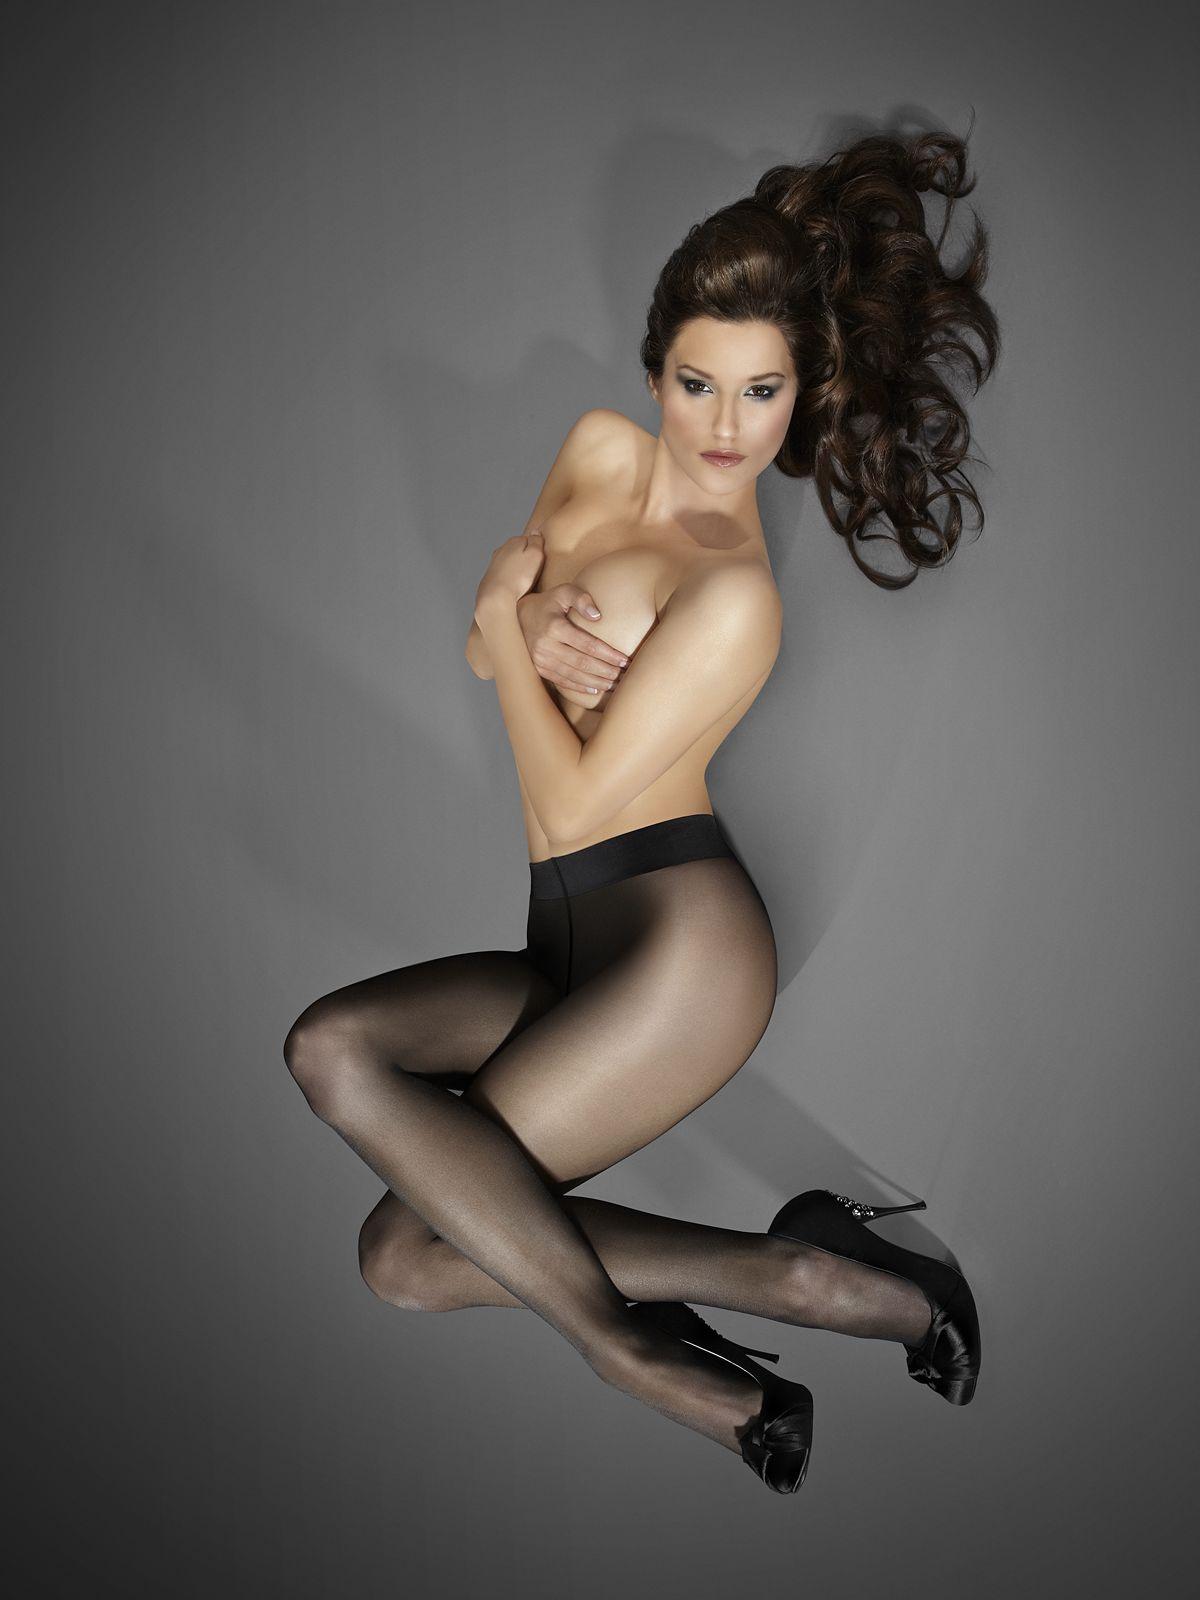 Marilyn Lux14-07